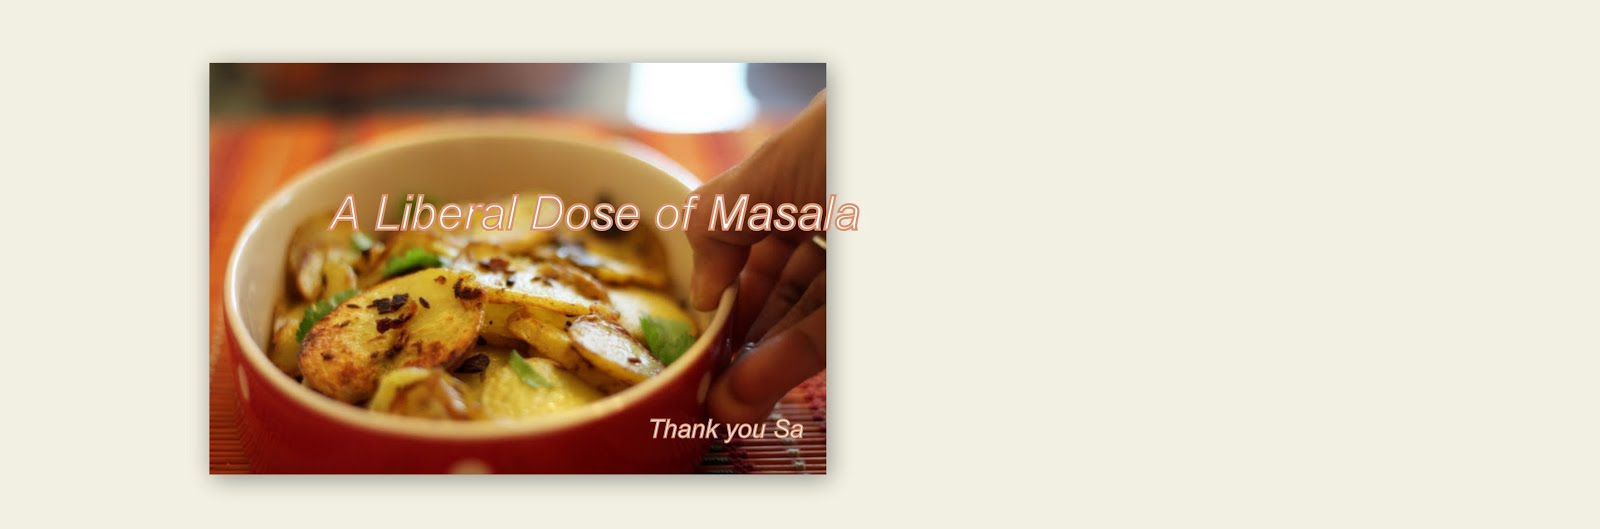 A Liberal dose of MASALA.